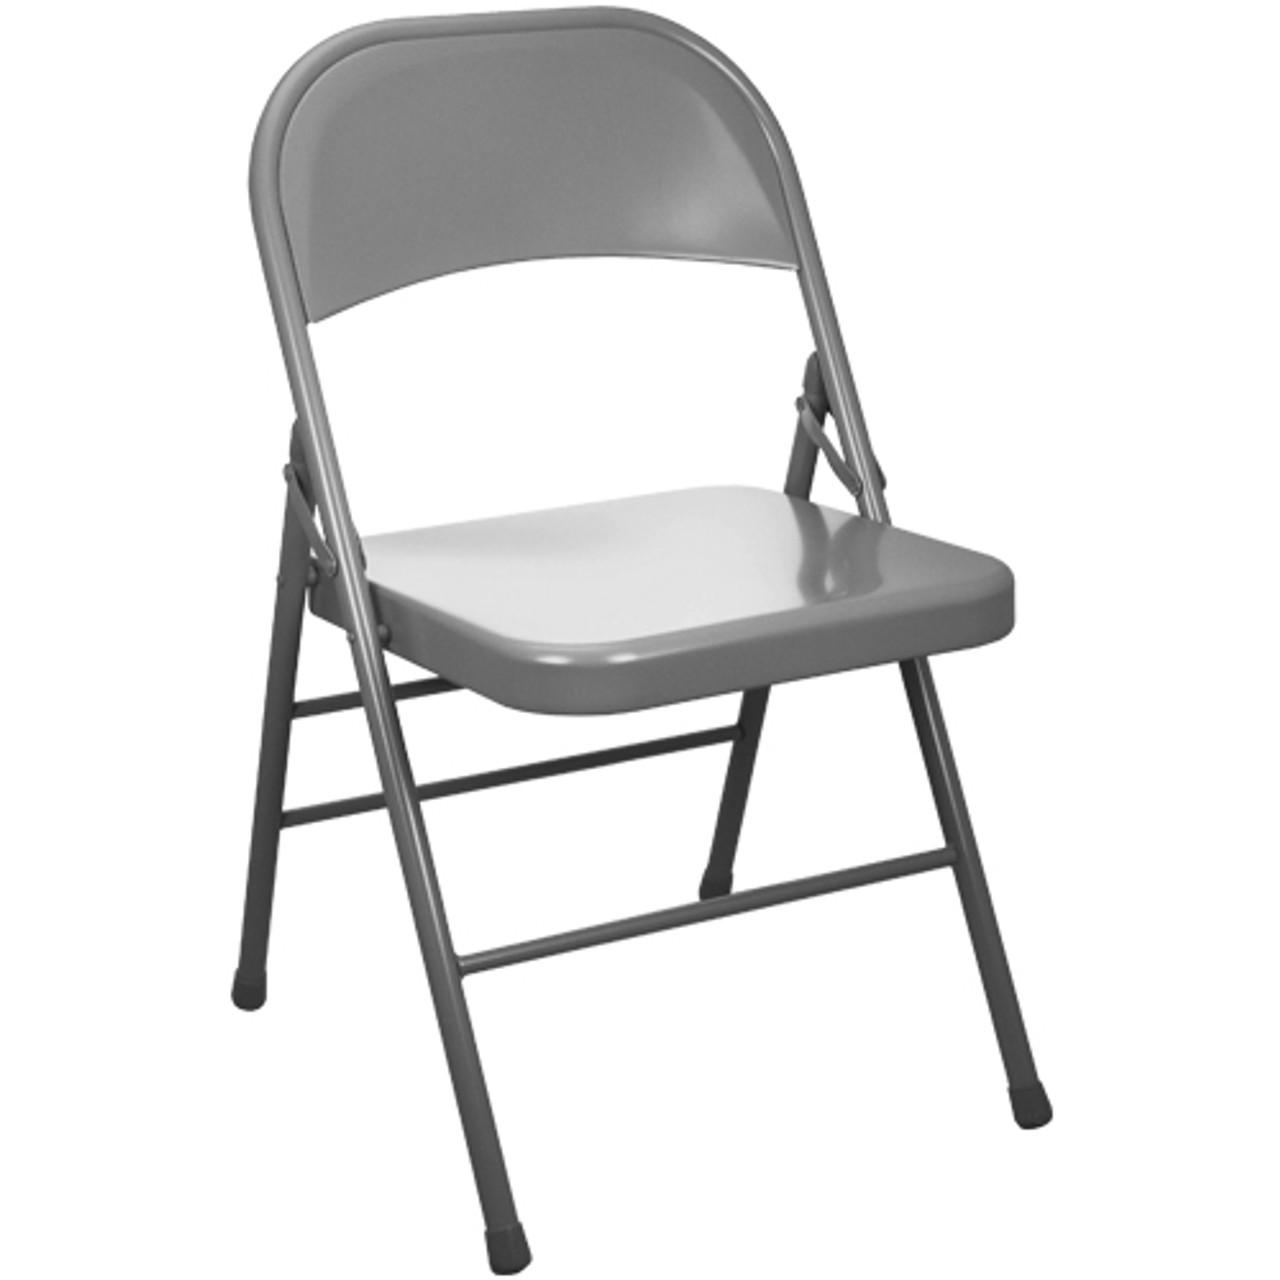 Gray Metal Folding Chairs Edpi903m Grey Metal Folding Chair